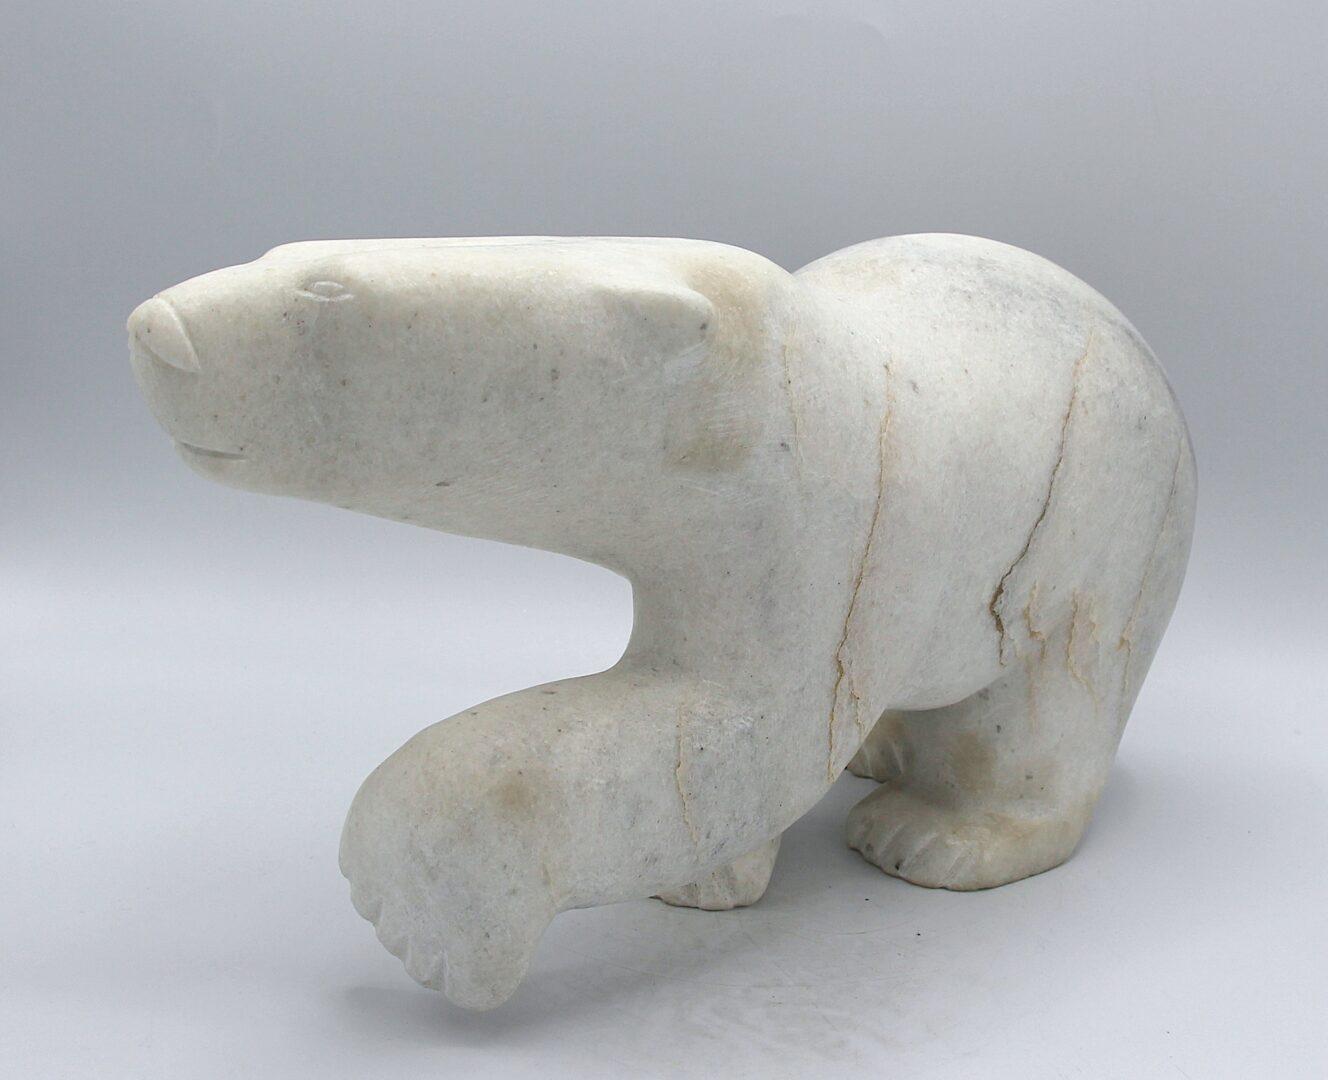 walking bear inuit art sculpture in marble